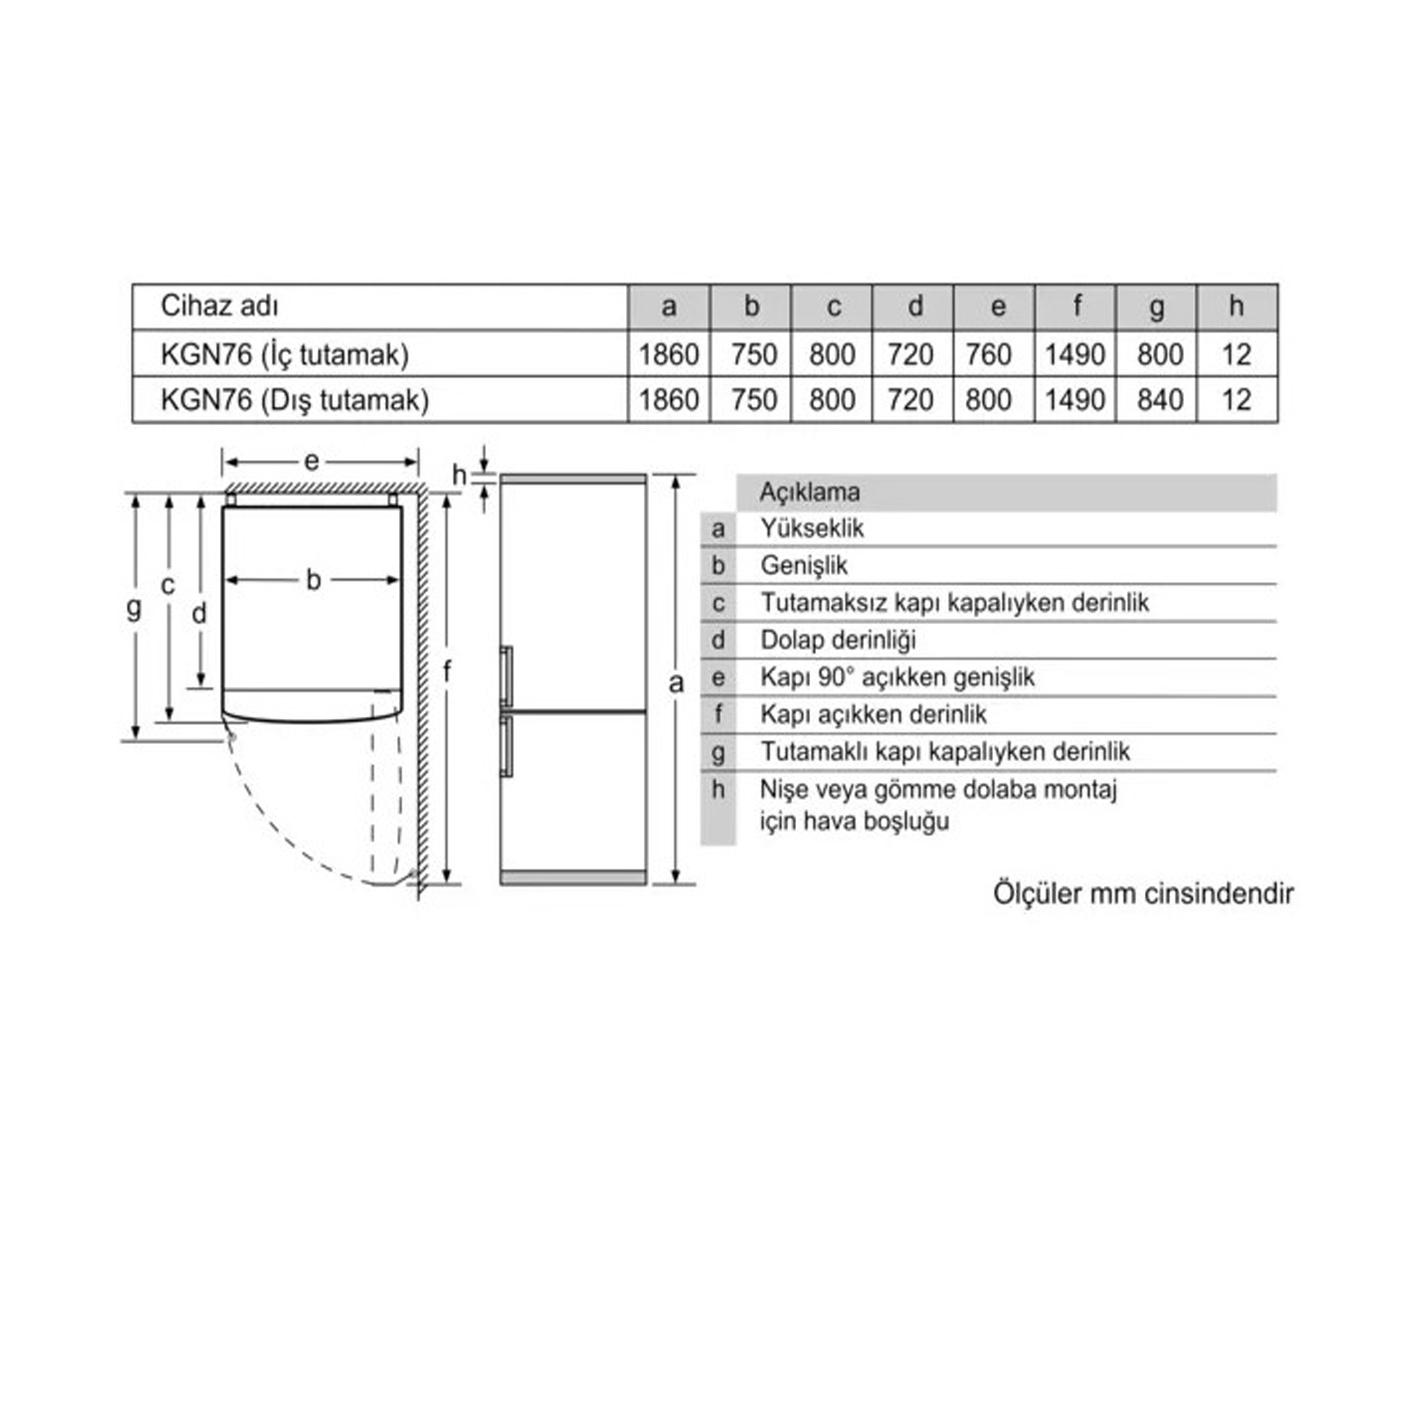 Profilo BD3076W3AN No-Frost Kombi Buzdolabı Süper Serisi XL